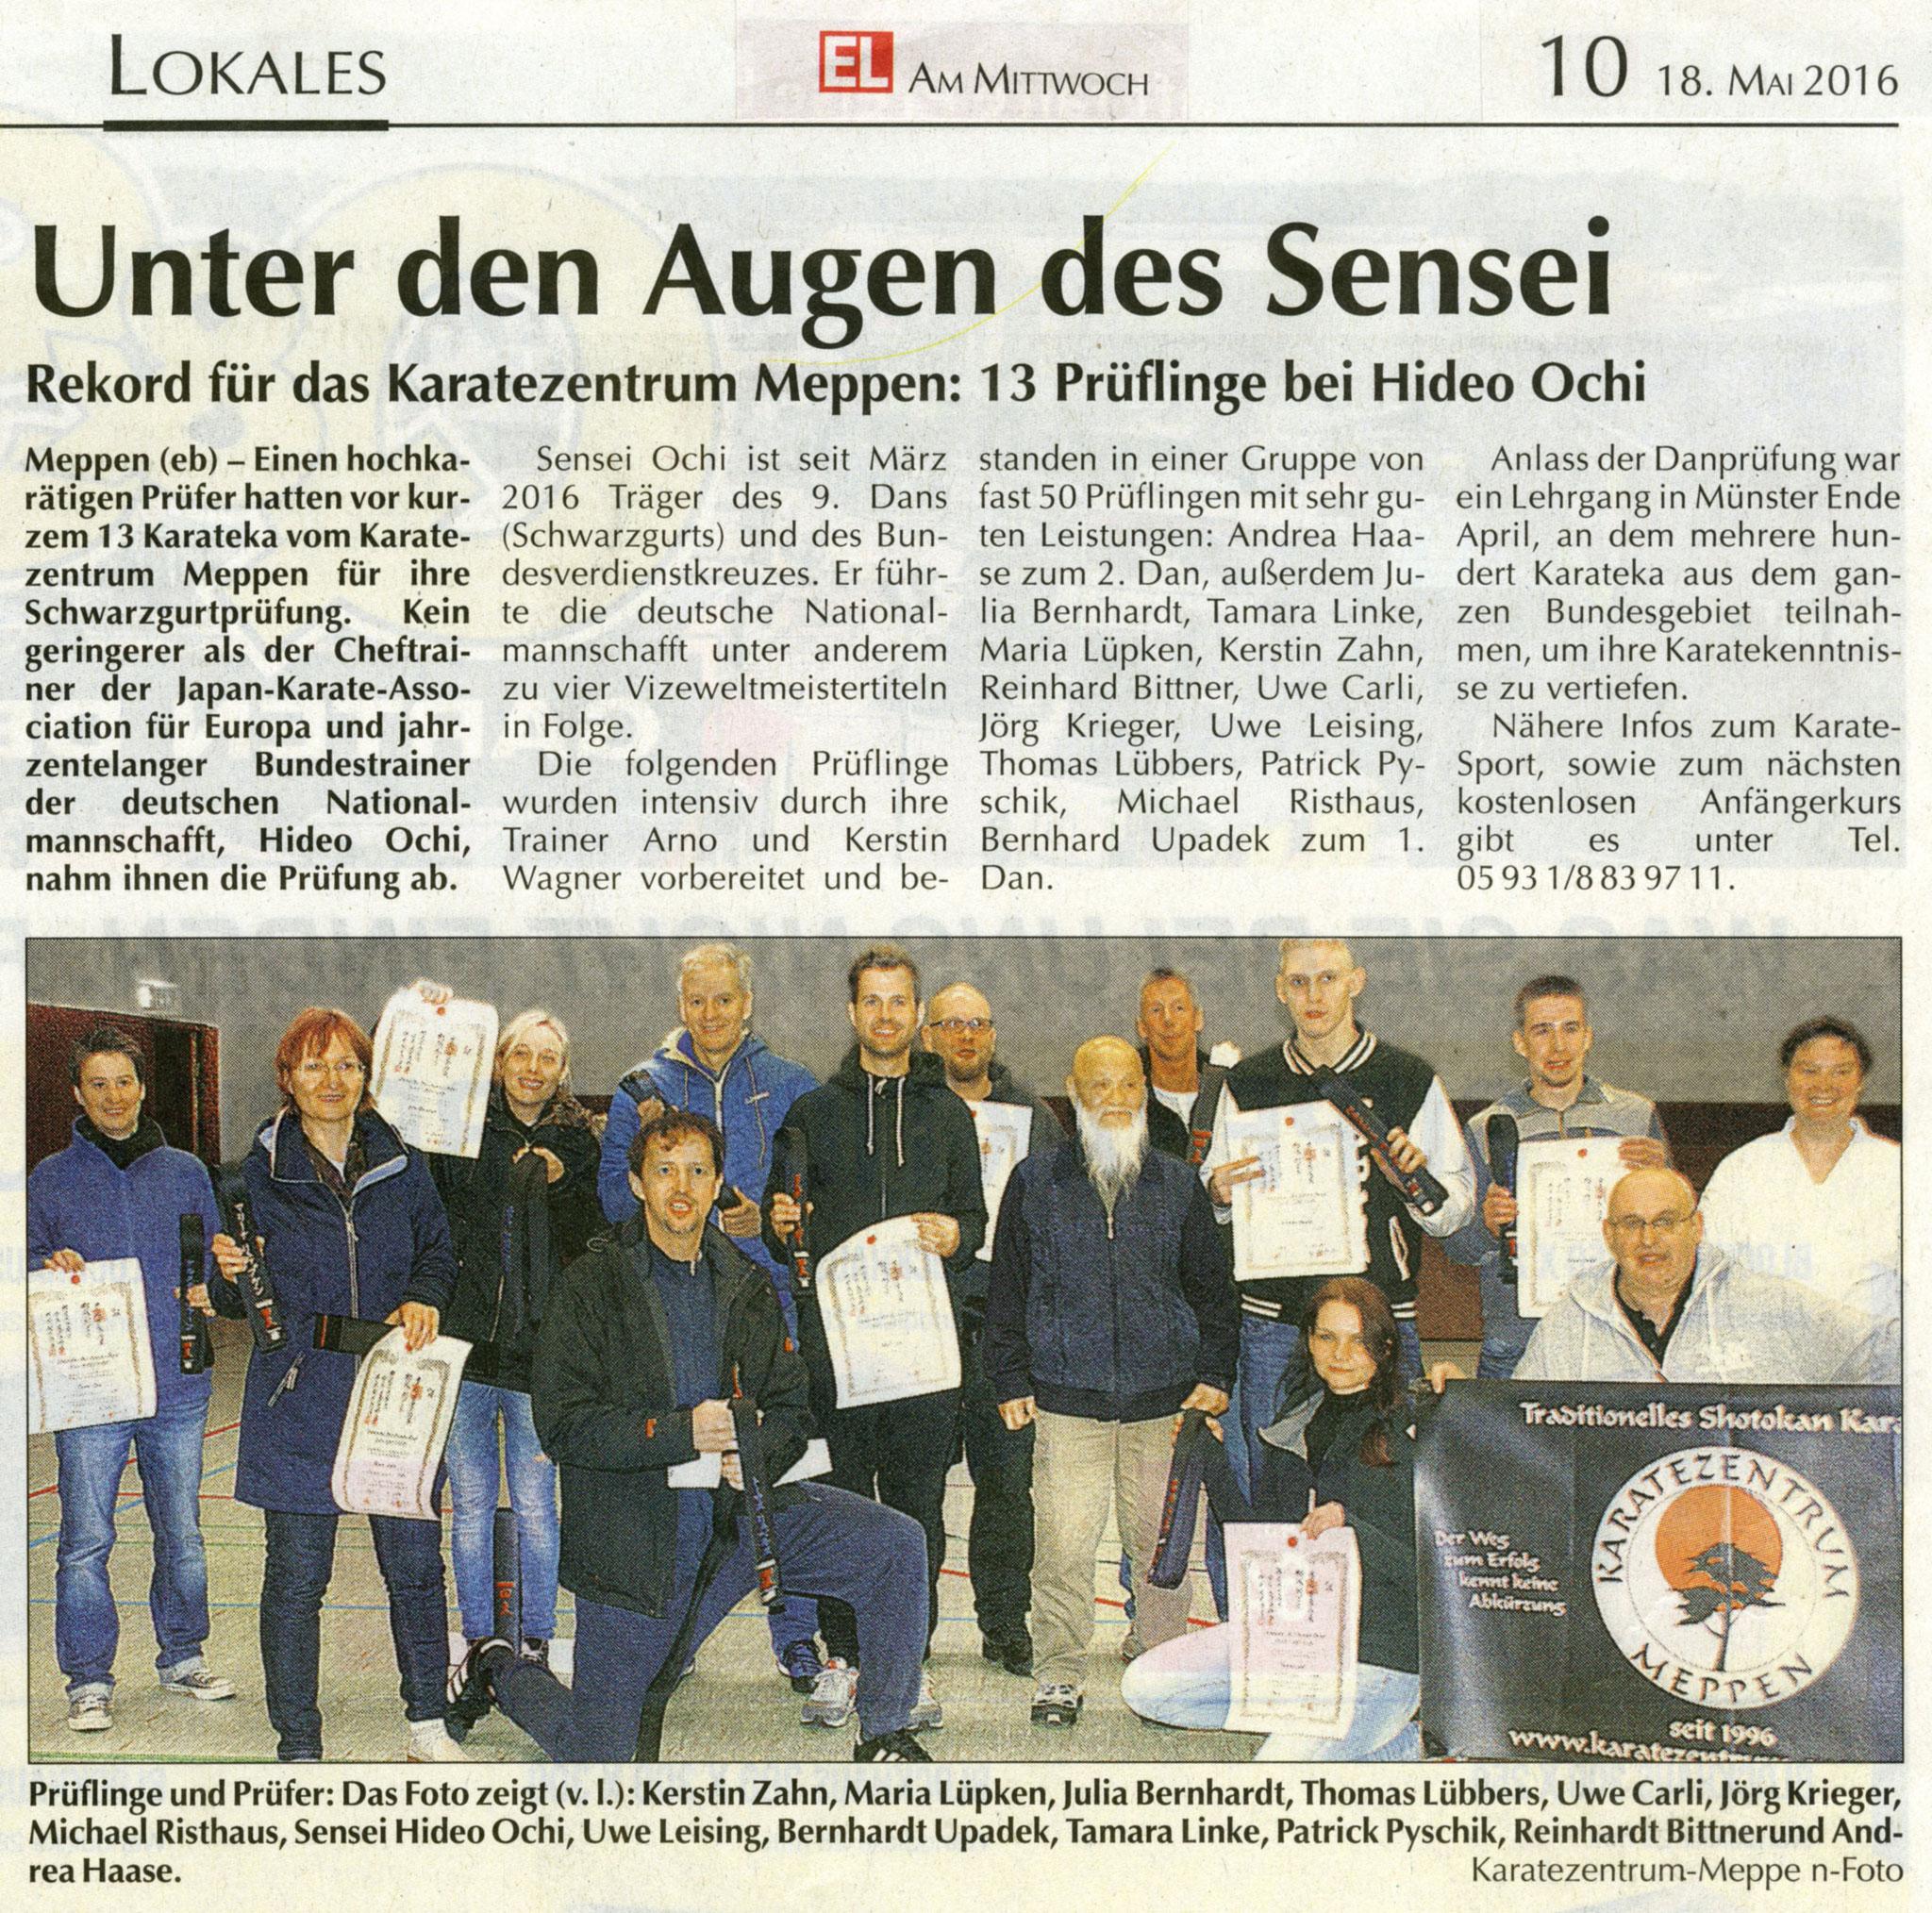 Danprüfungen Münster 30.04.2016, EL-Kurier am 18.05.2016